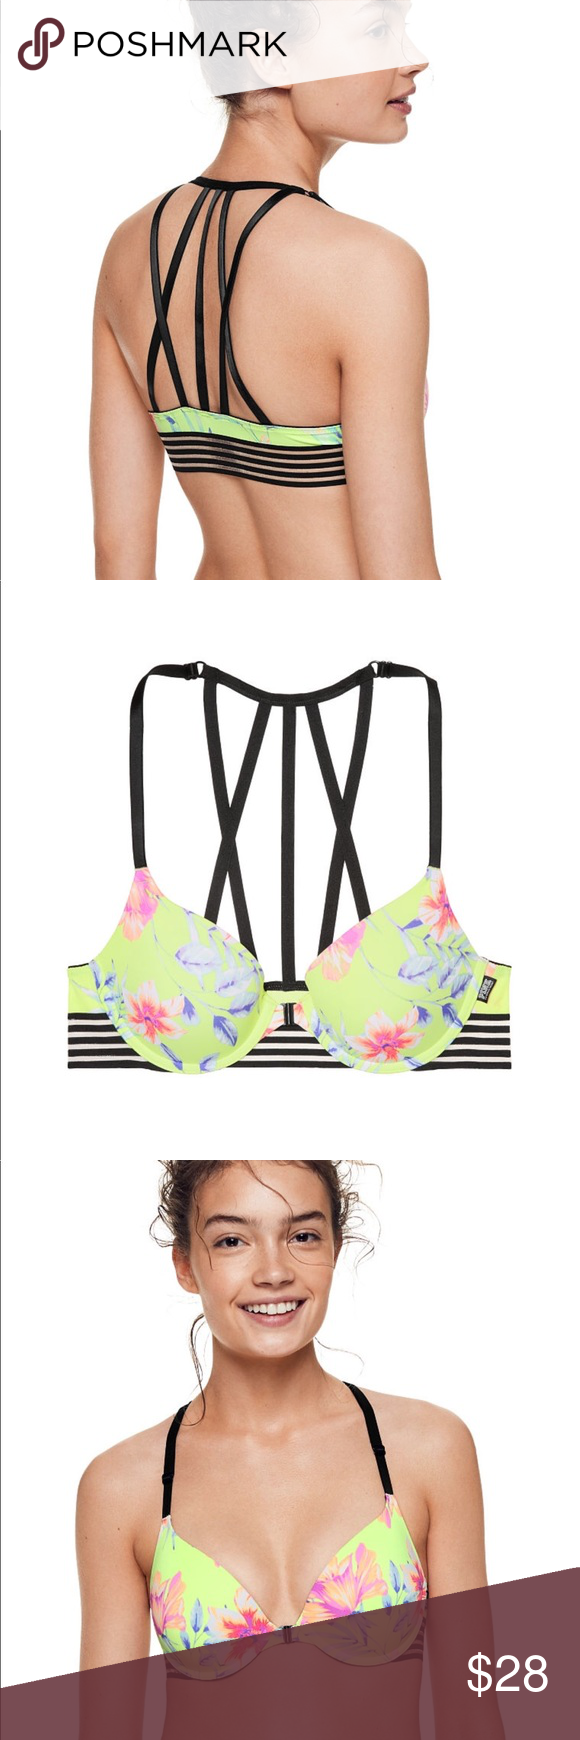 bfcbd4874a2 VS PINK Wear Everywhere Strappy Push-up Bra - 34B New in Victoria s Secret  Online